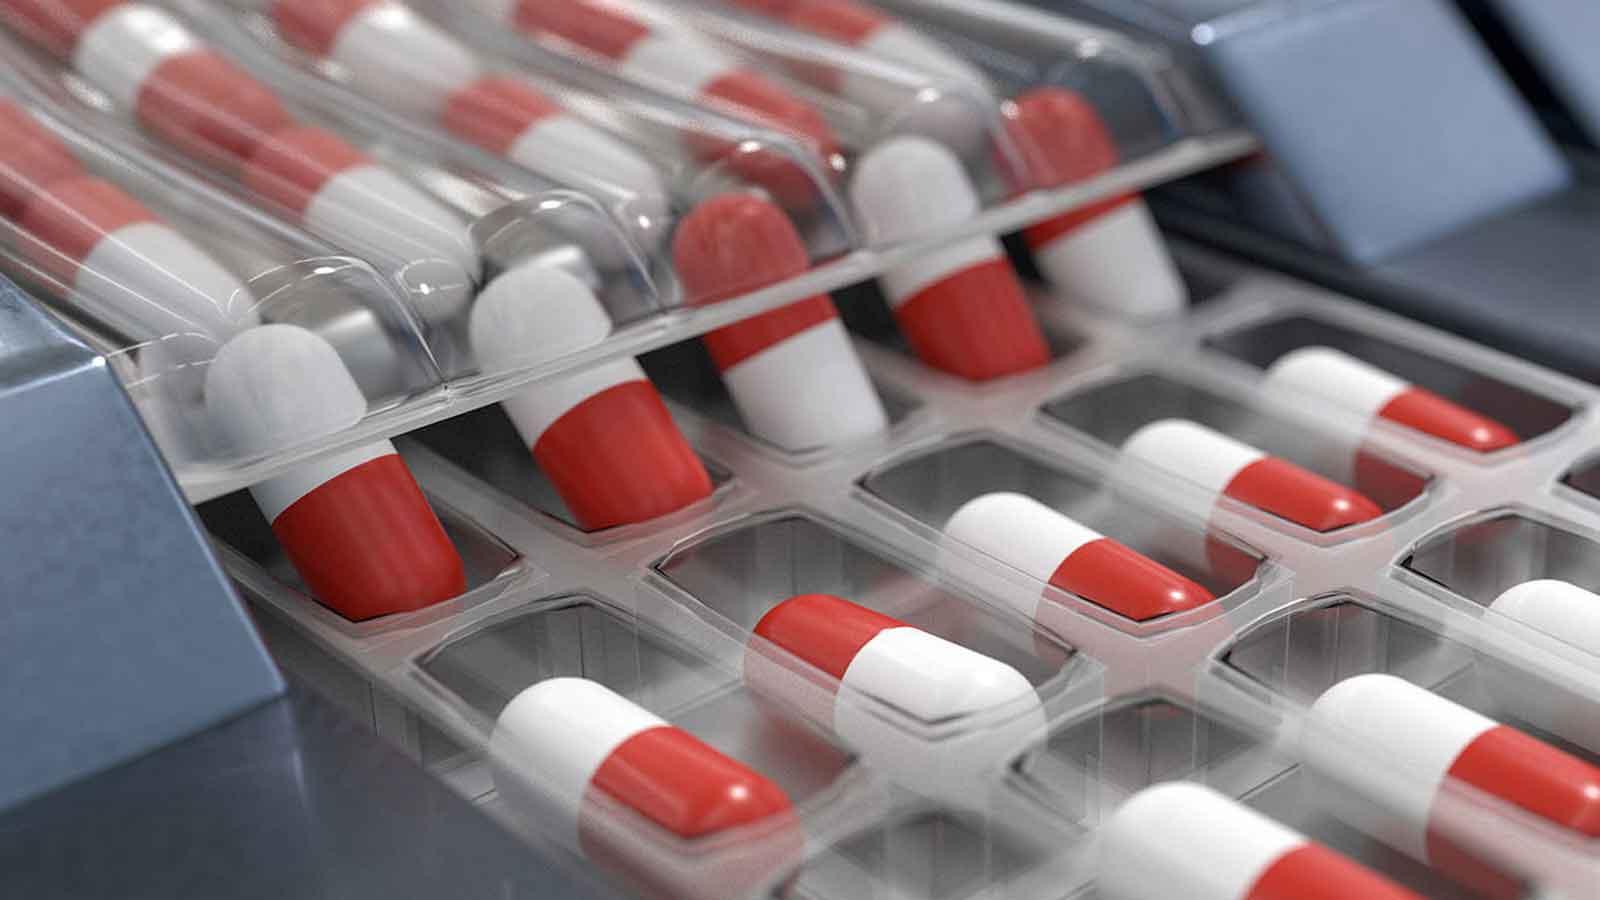 Pharmaceutical LIMS